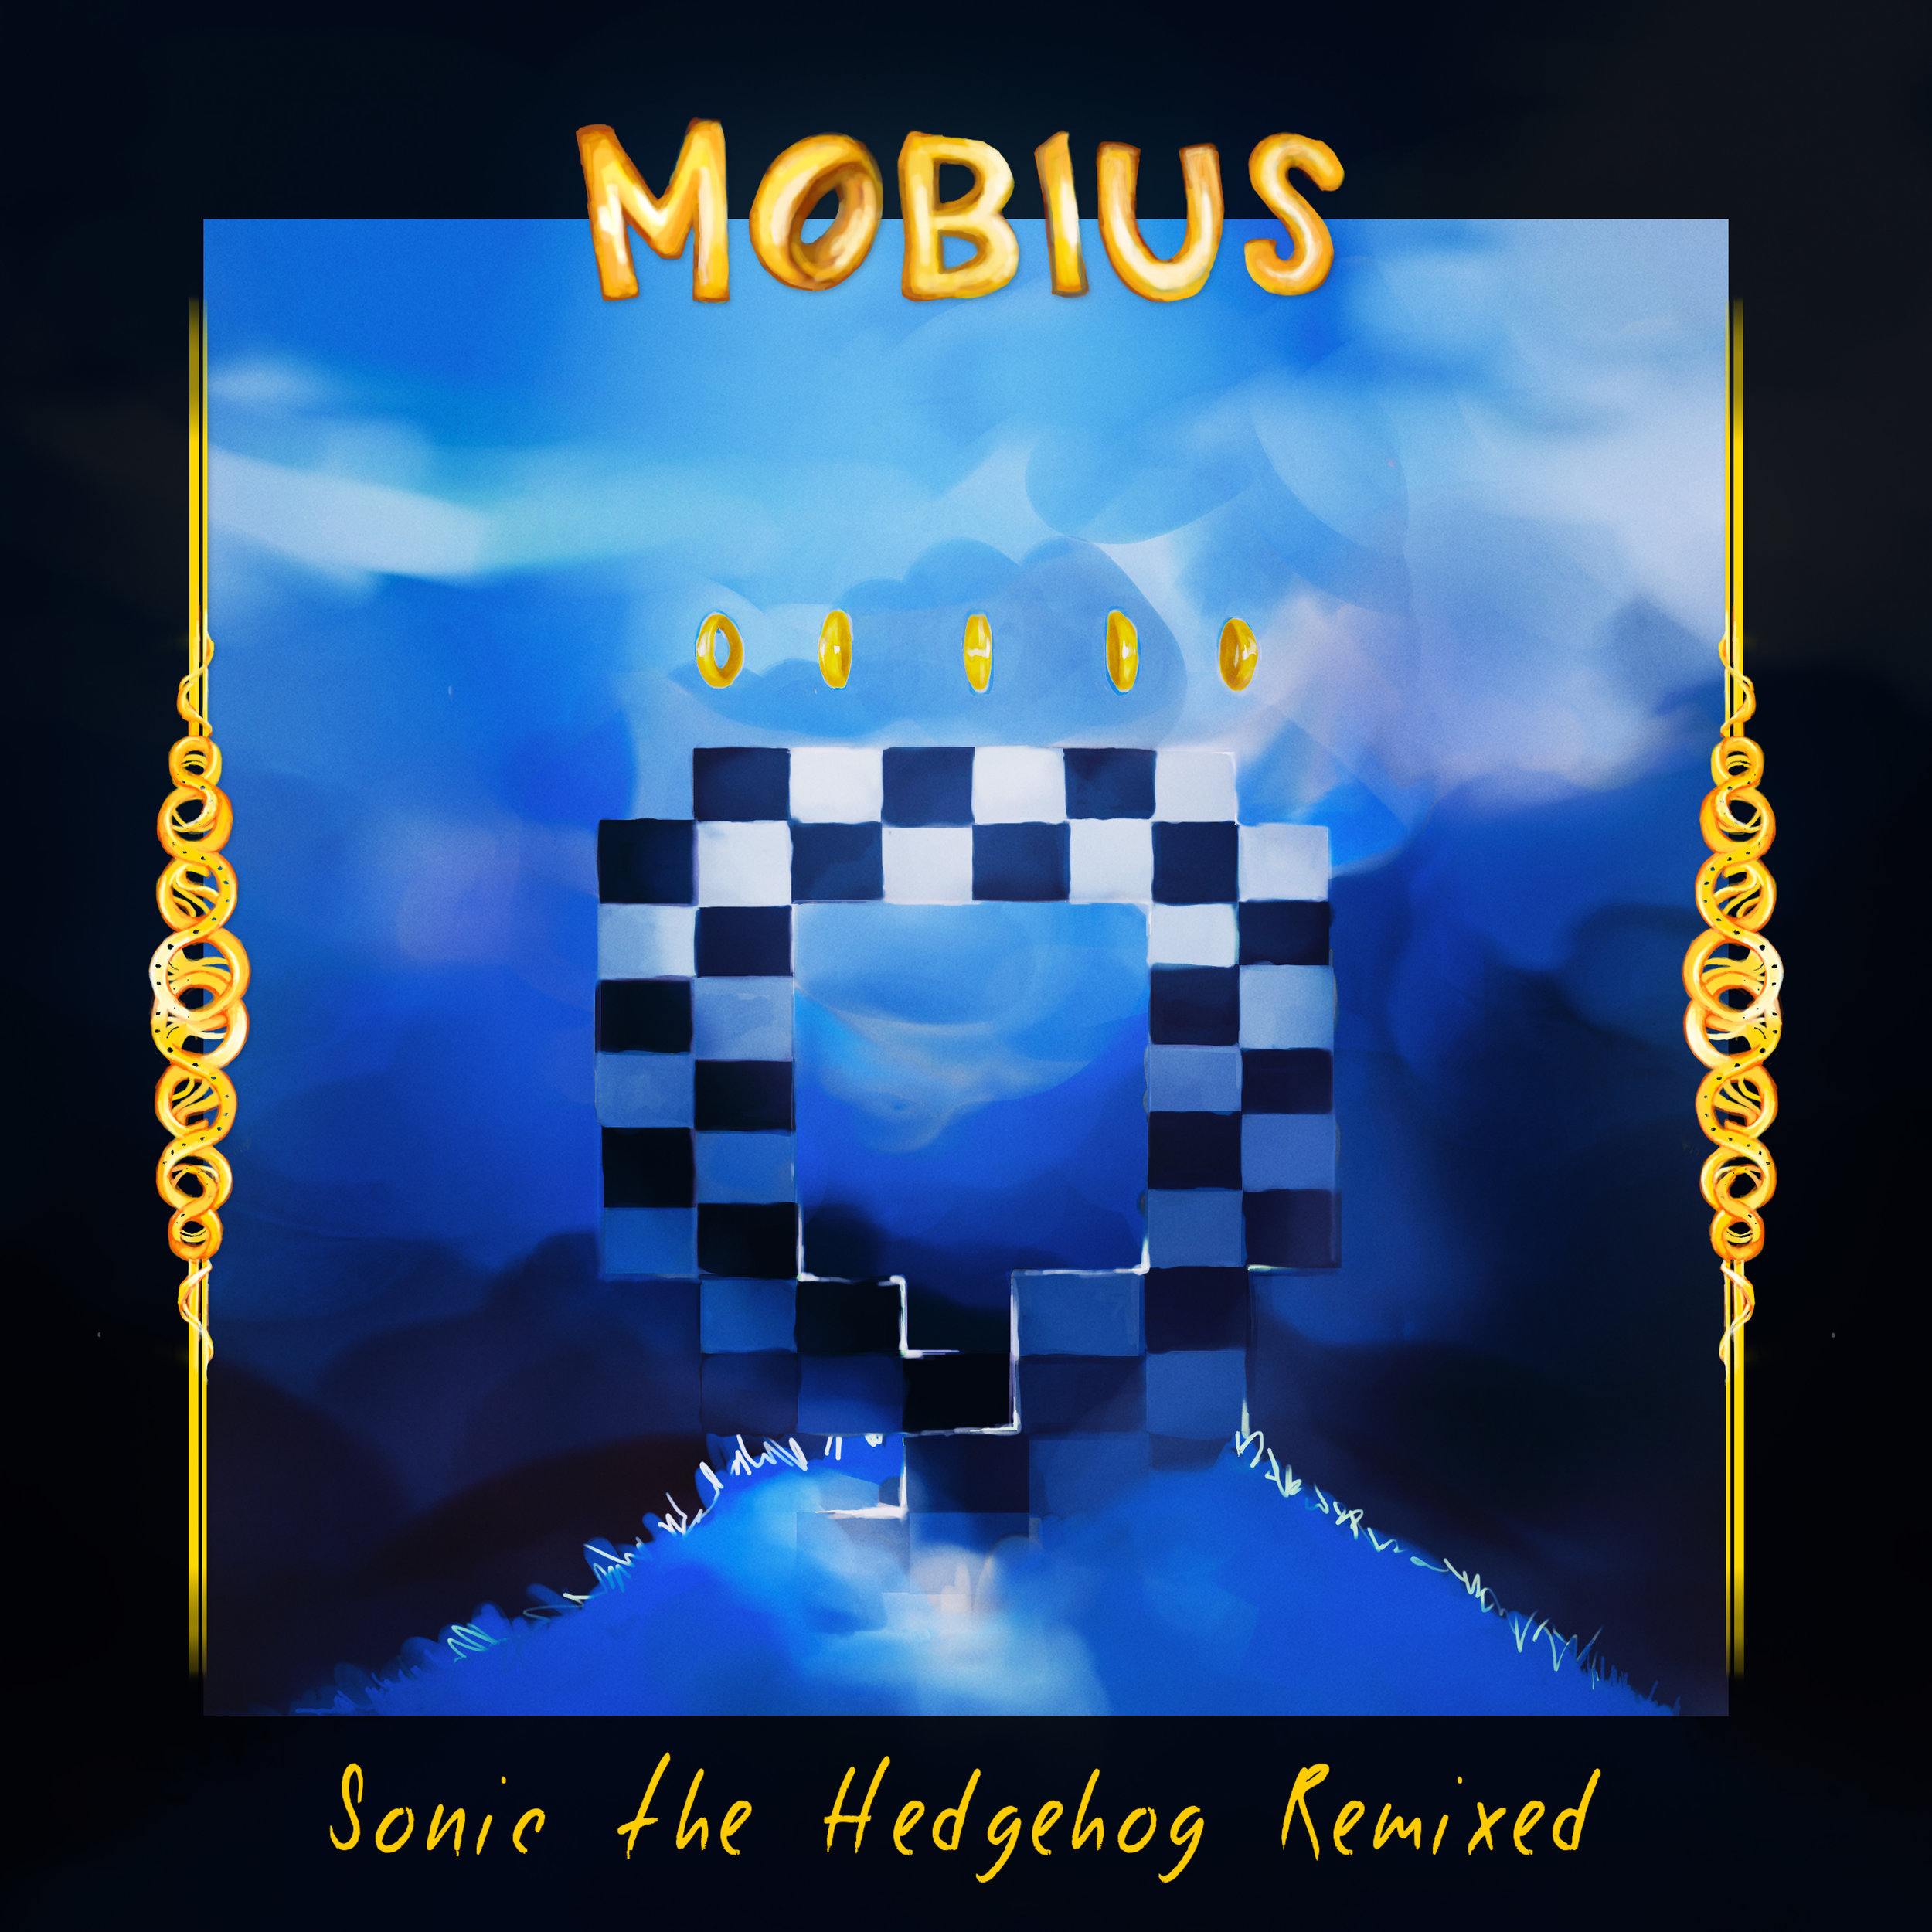 mobius-sonic-the-hedgehog-remixed-album-cover.jpg